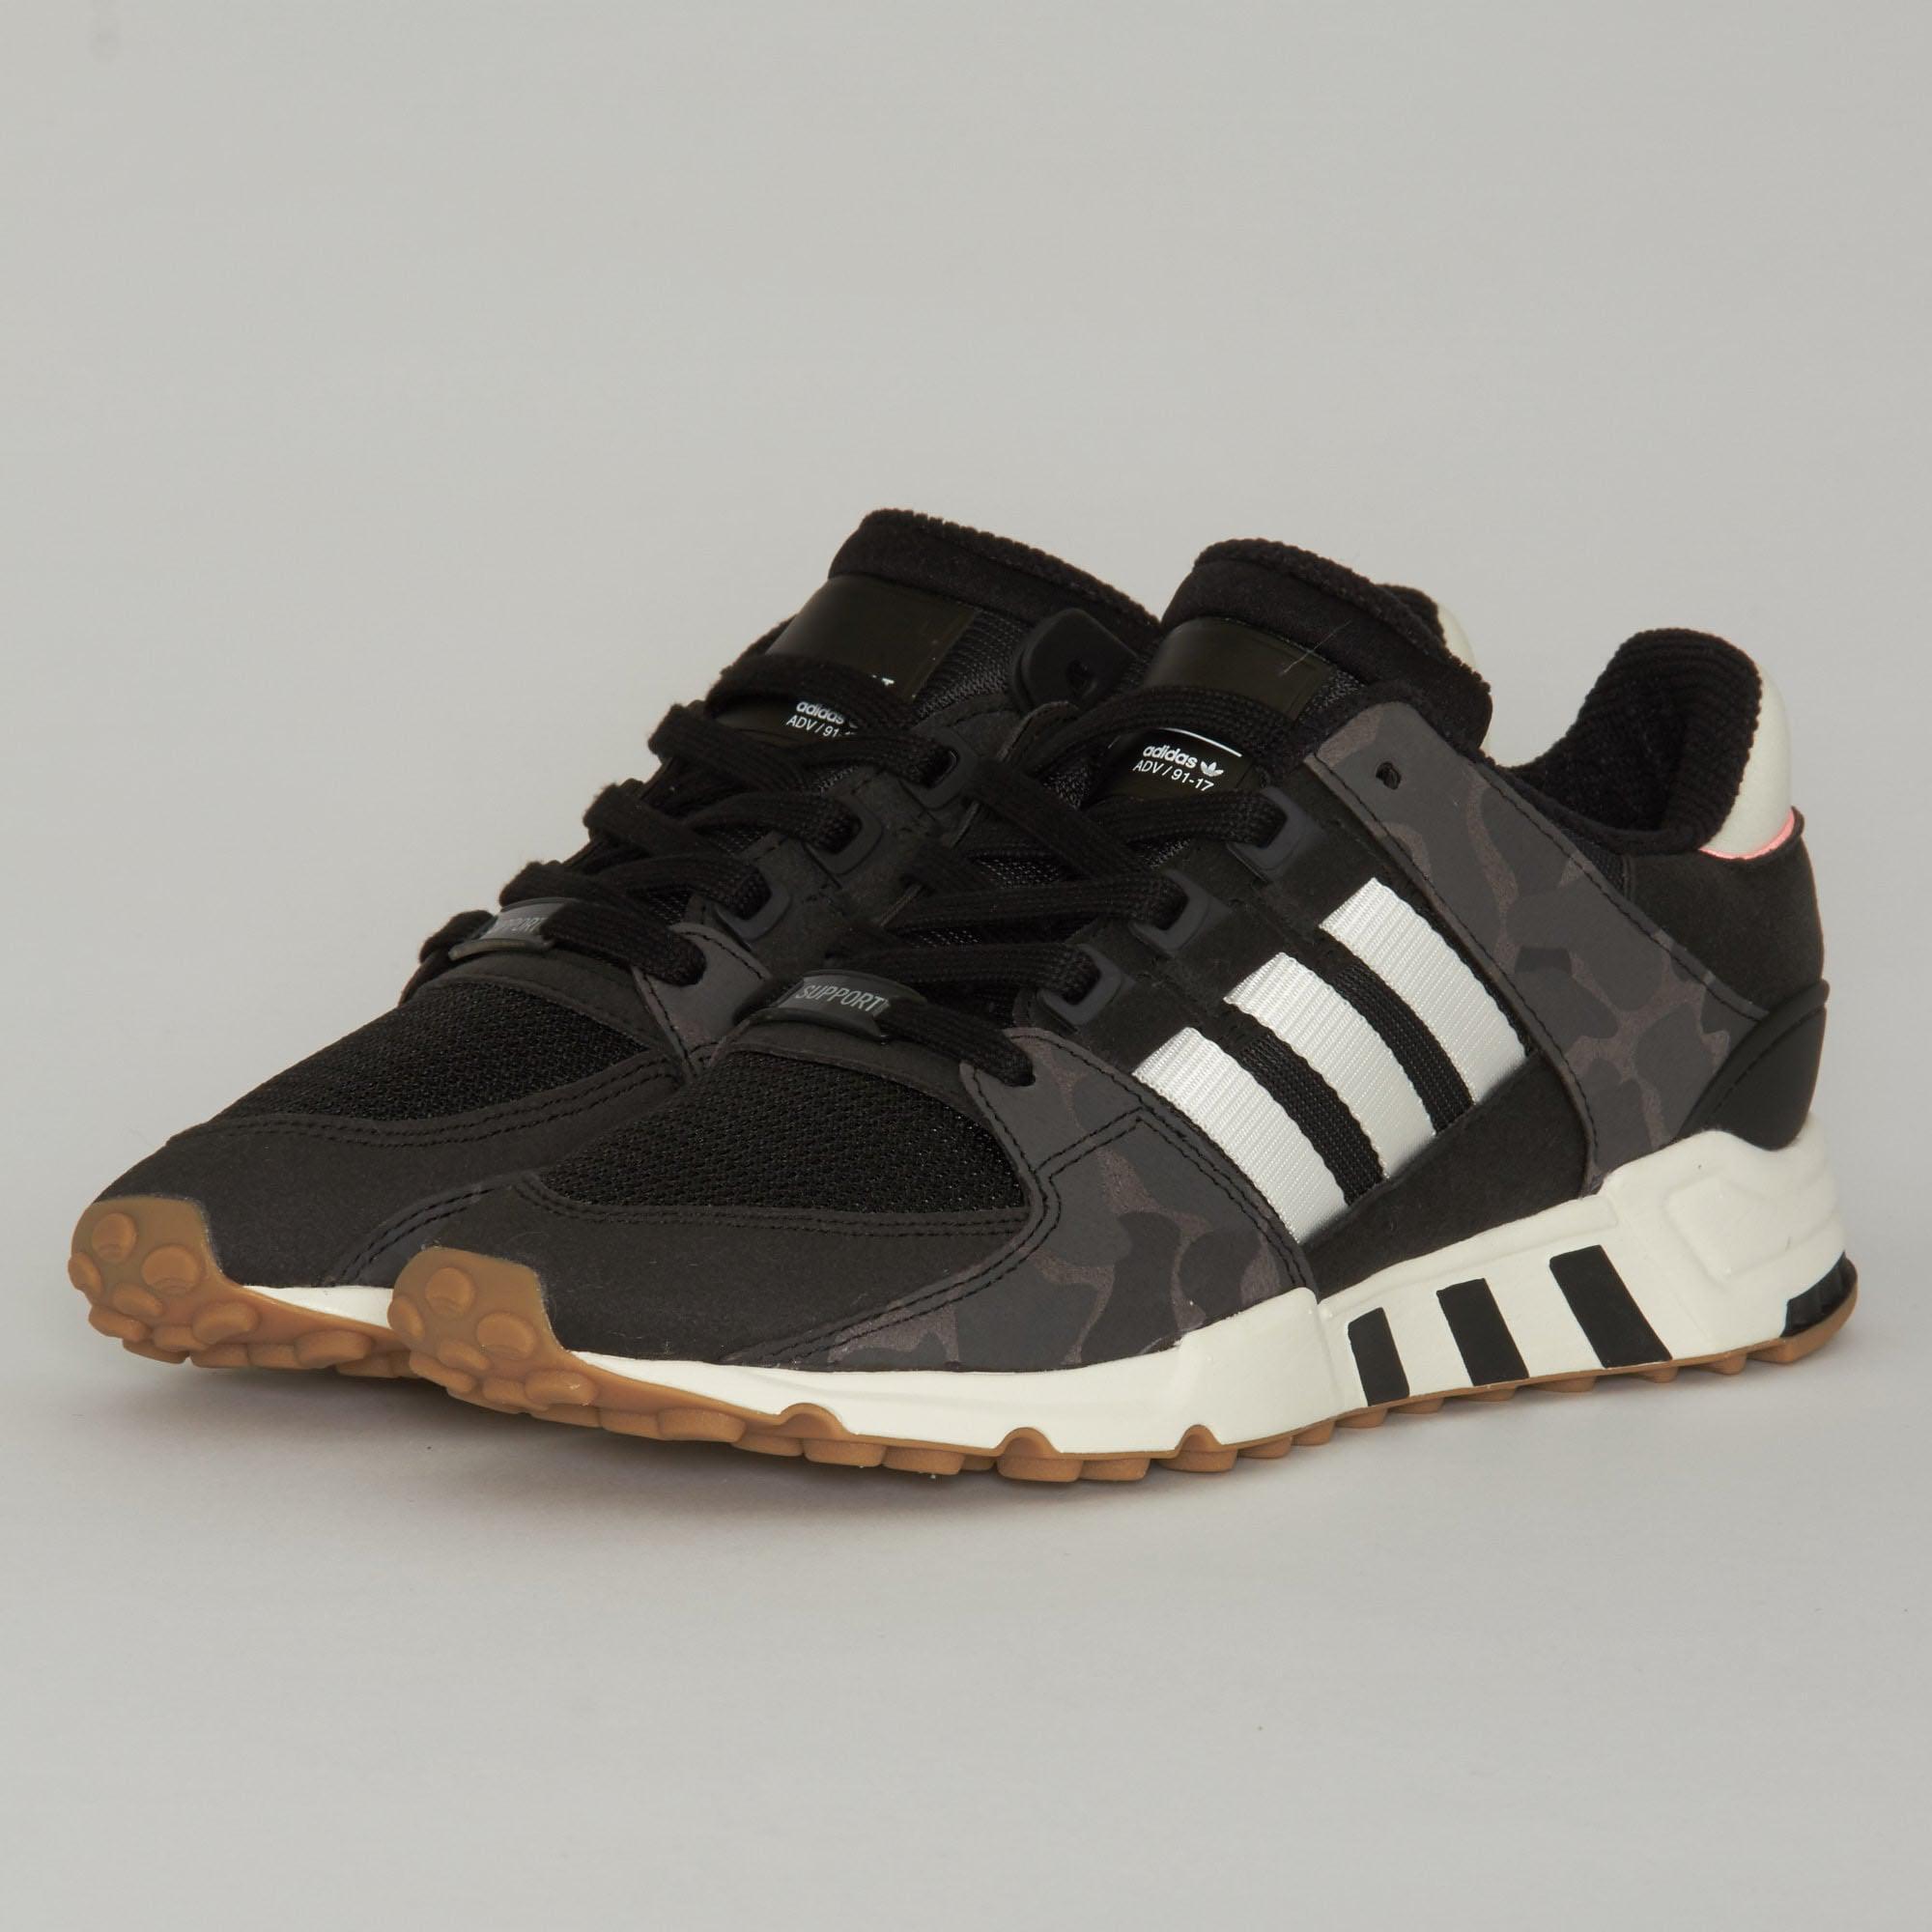 best cheap 6fa70 af88c Lyst - adidas Originals Adidas Eqt Support Rf Black Shoes in